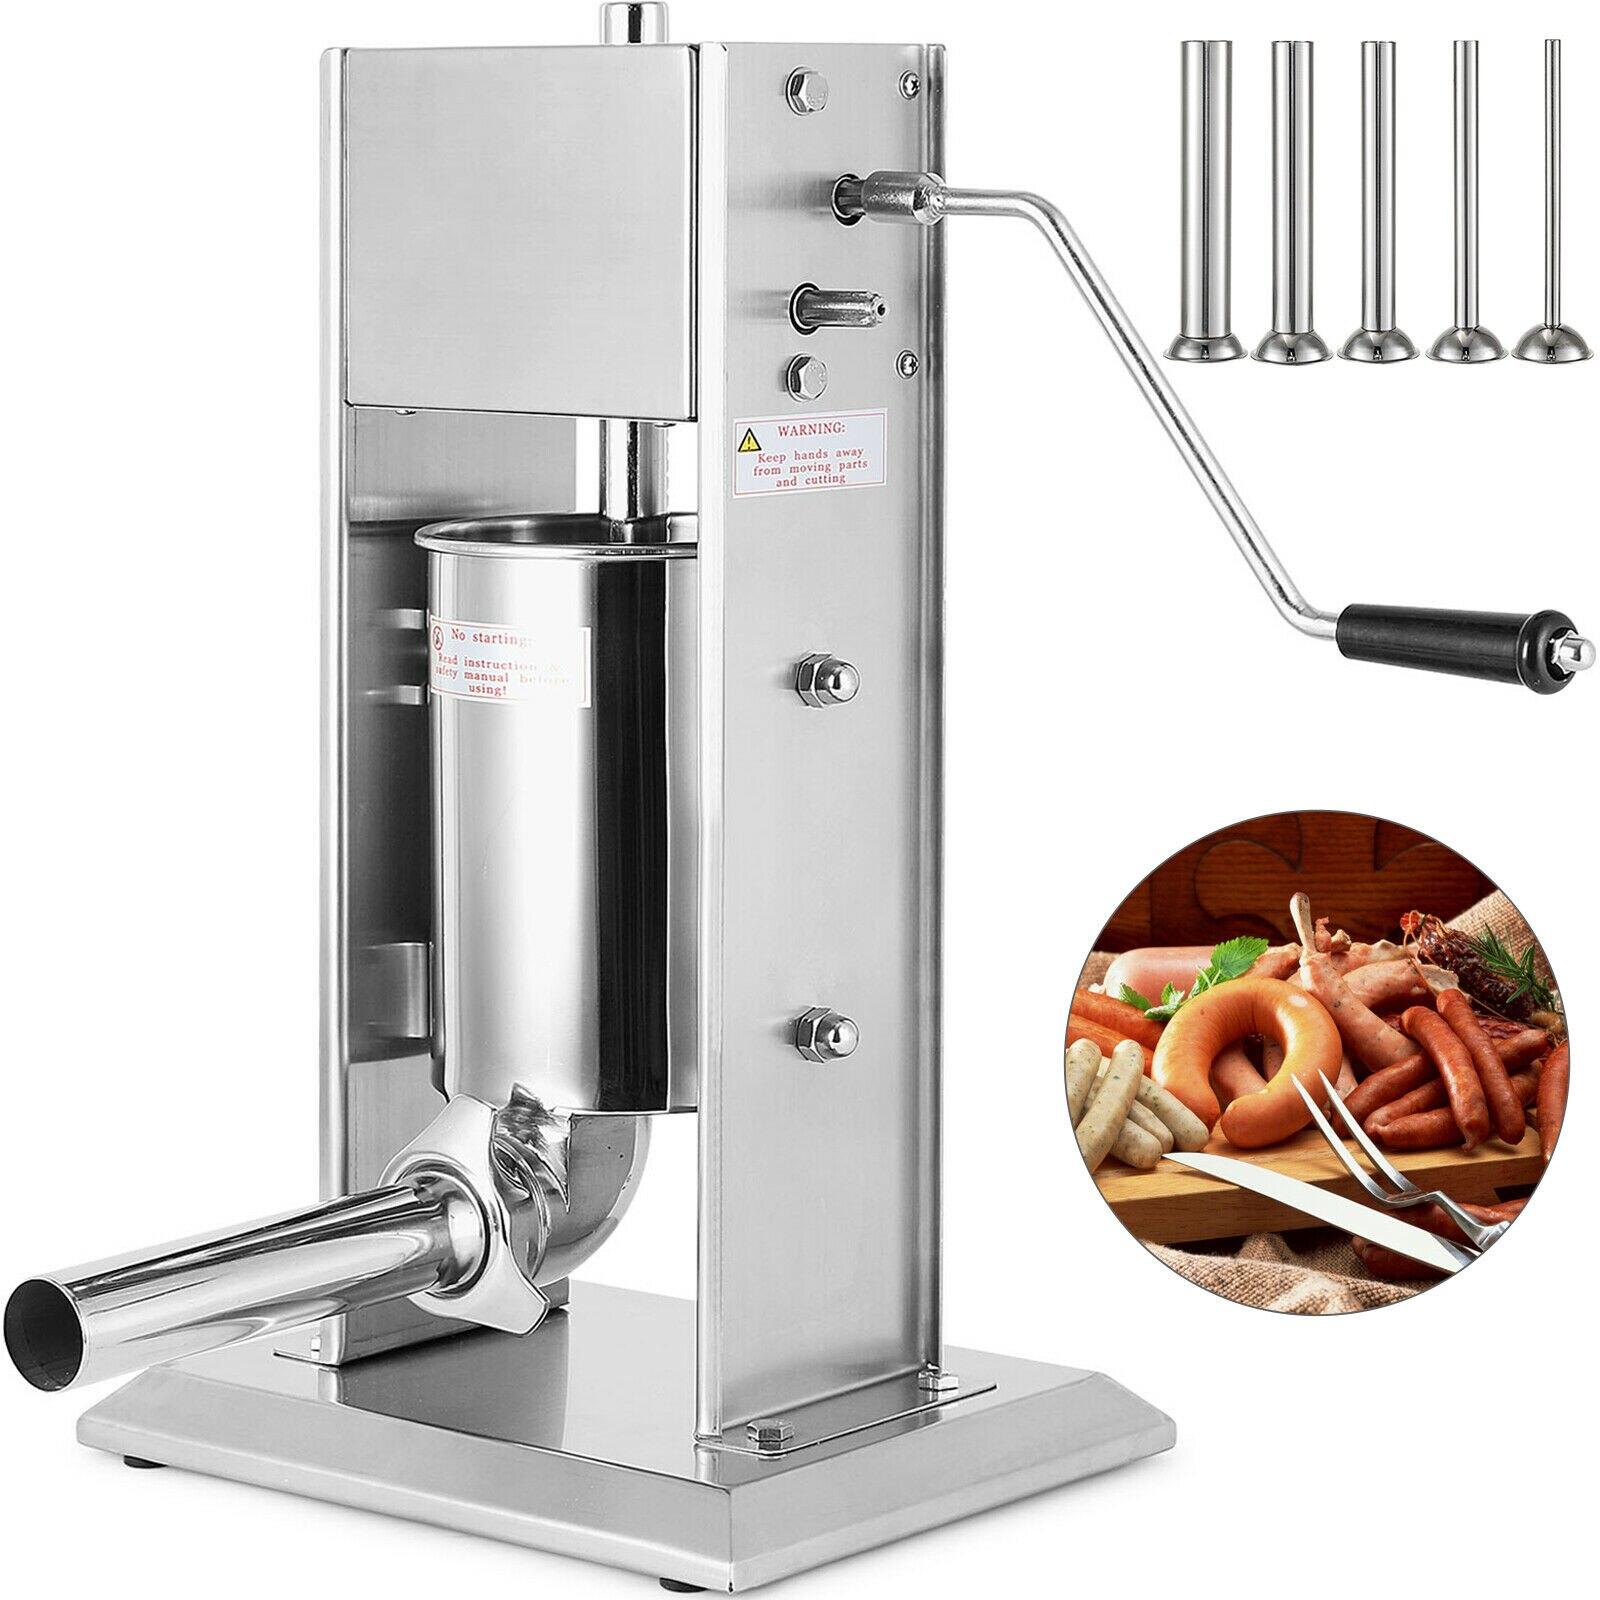 3l 소시지 stuffer 필러 메이커 고기 기계 5 노즐 상업 식당-에서만능 조리 기구 부품부터 가전 제품 의 title=